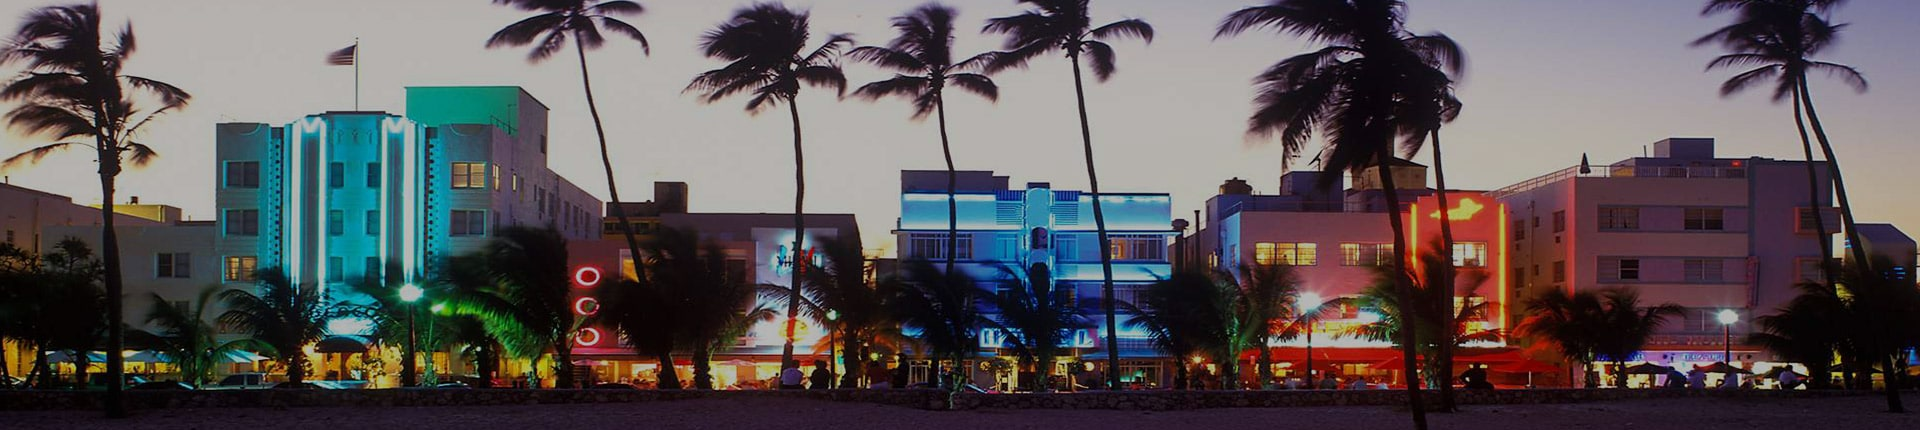 Miami Billboard Company and Advertising